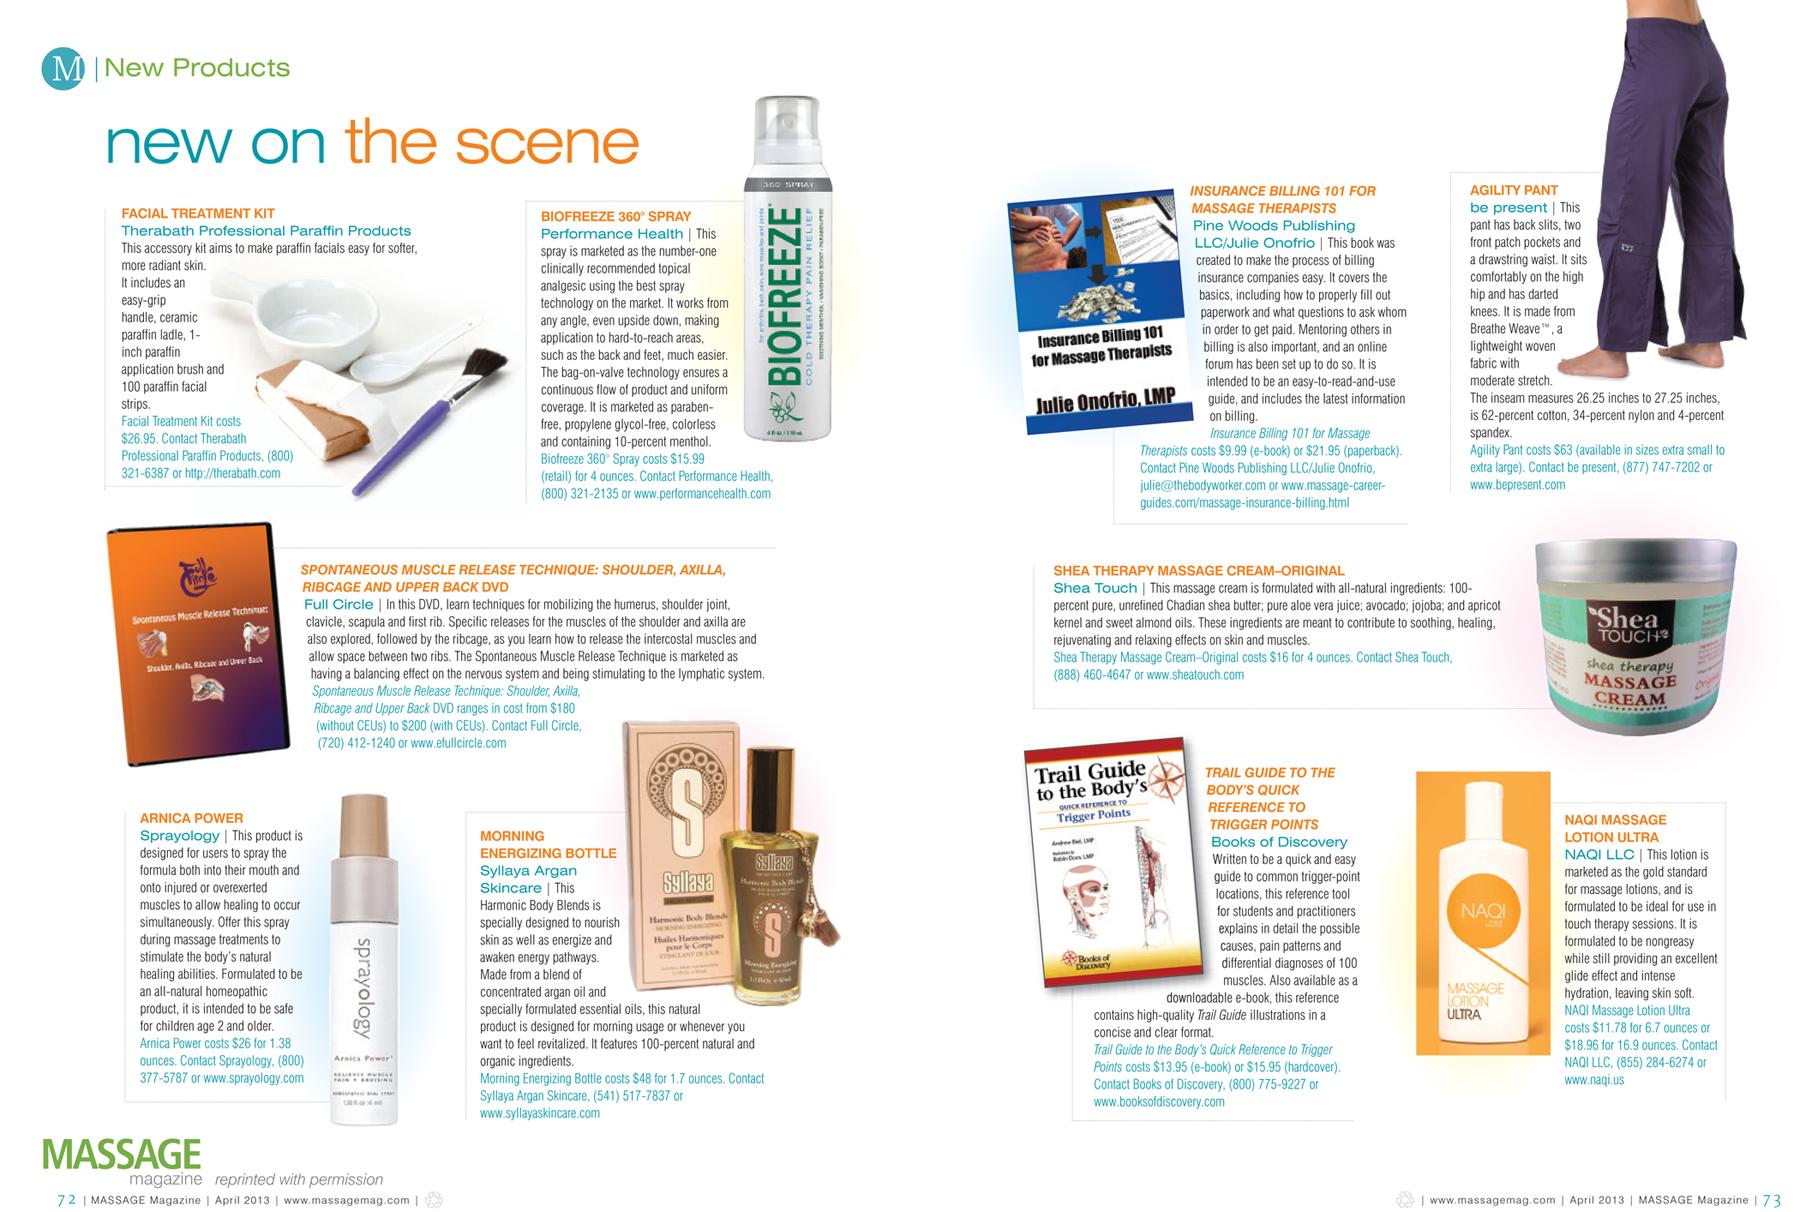 Massage Magazine - April 2013